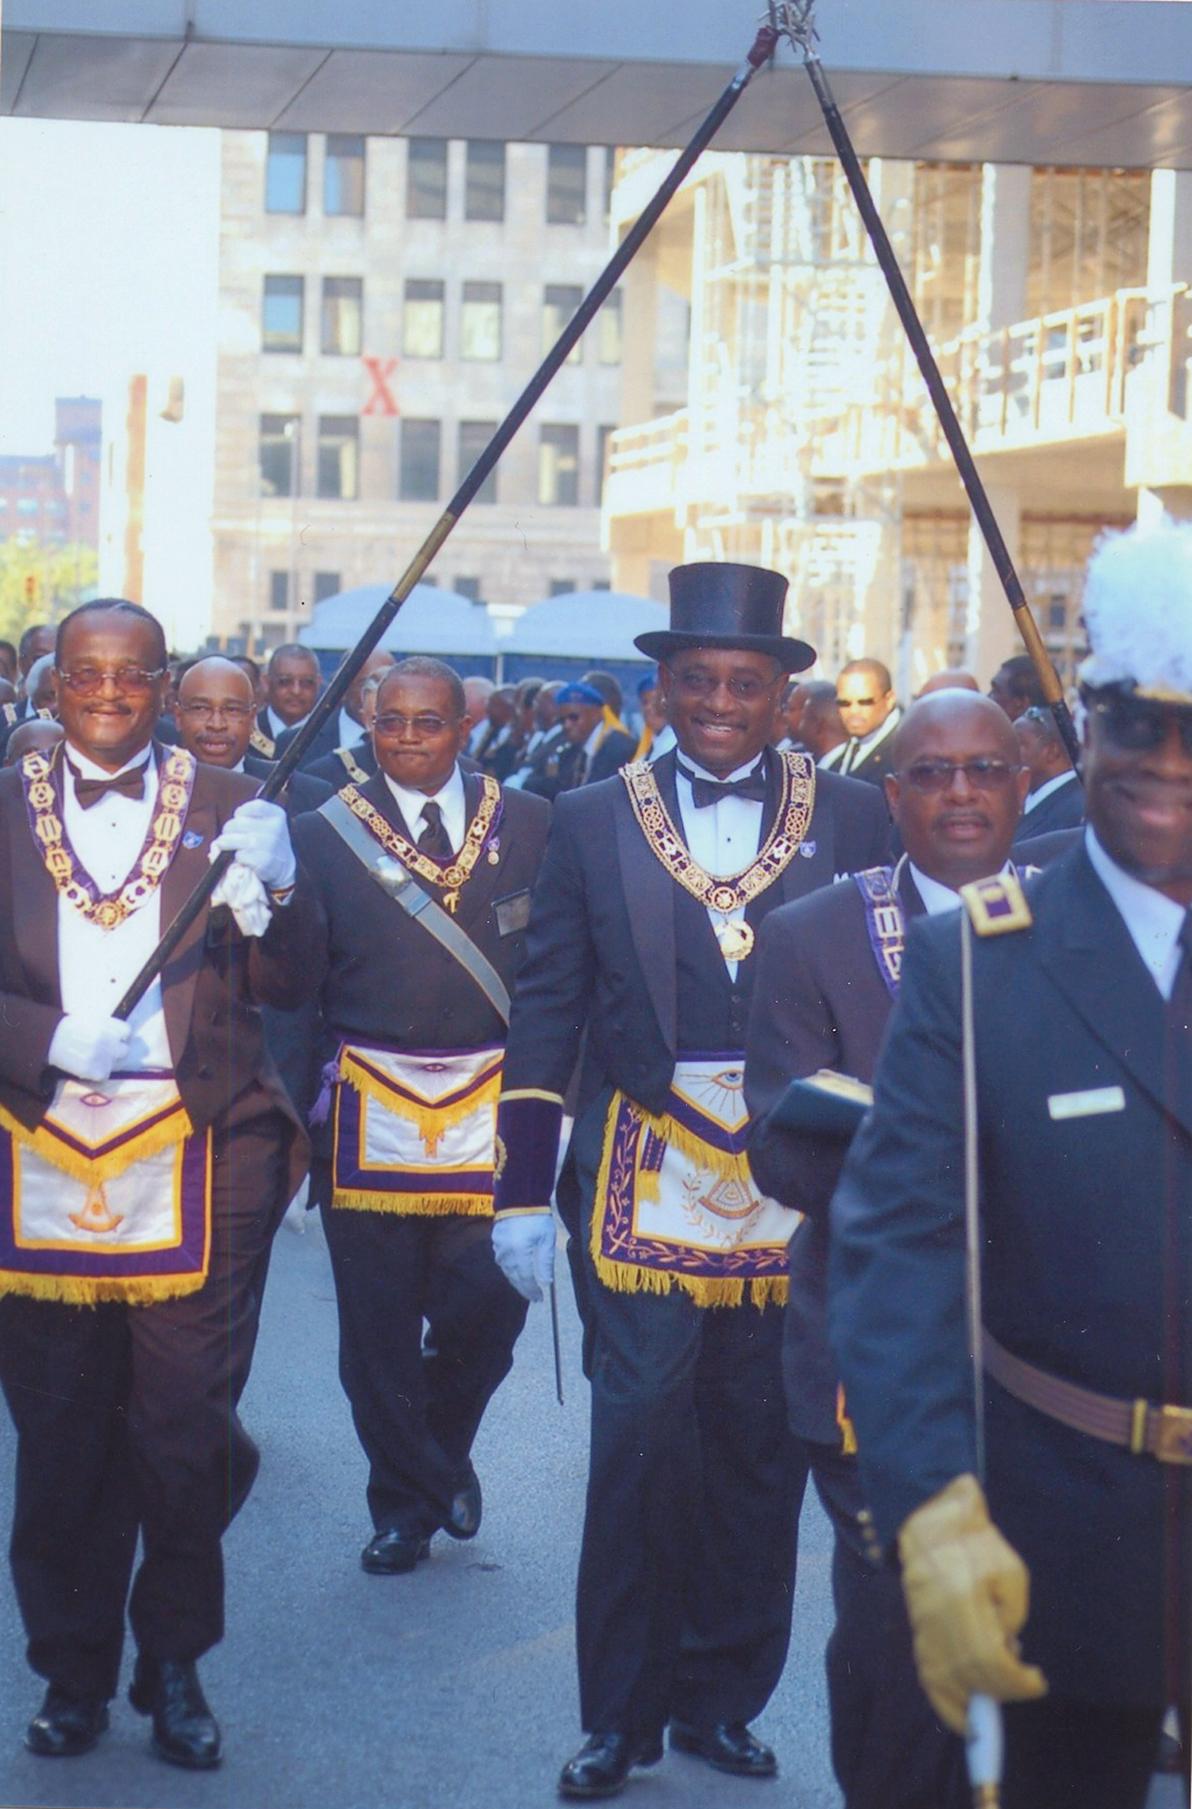 Local Prince Hall Masons mark 150 years of history ...